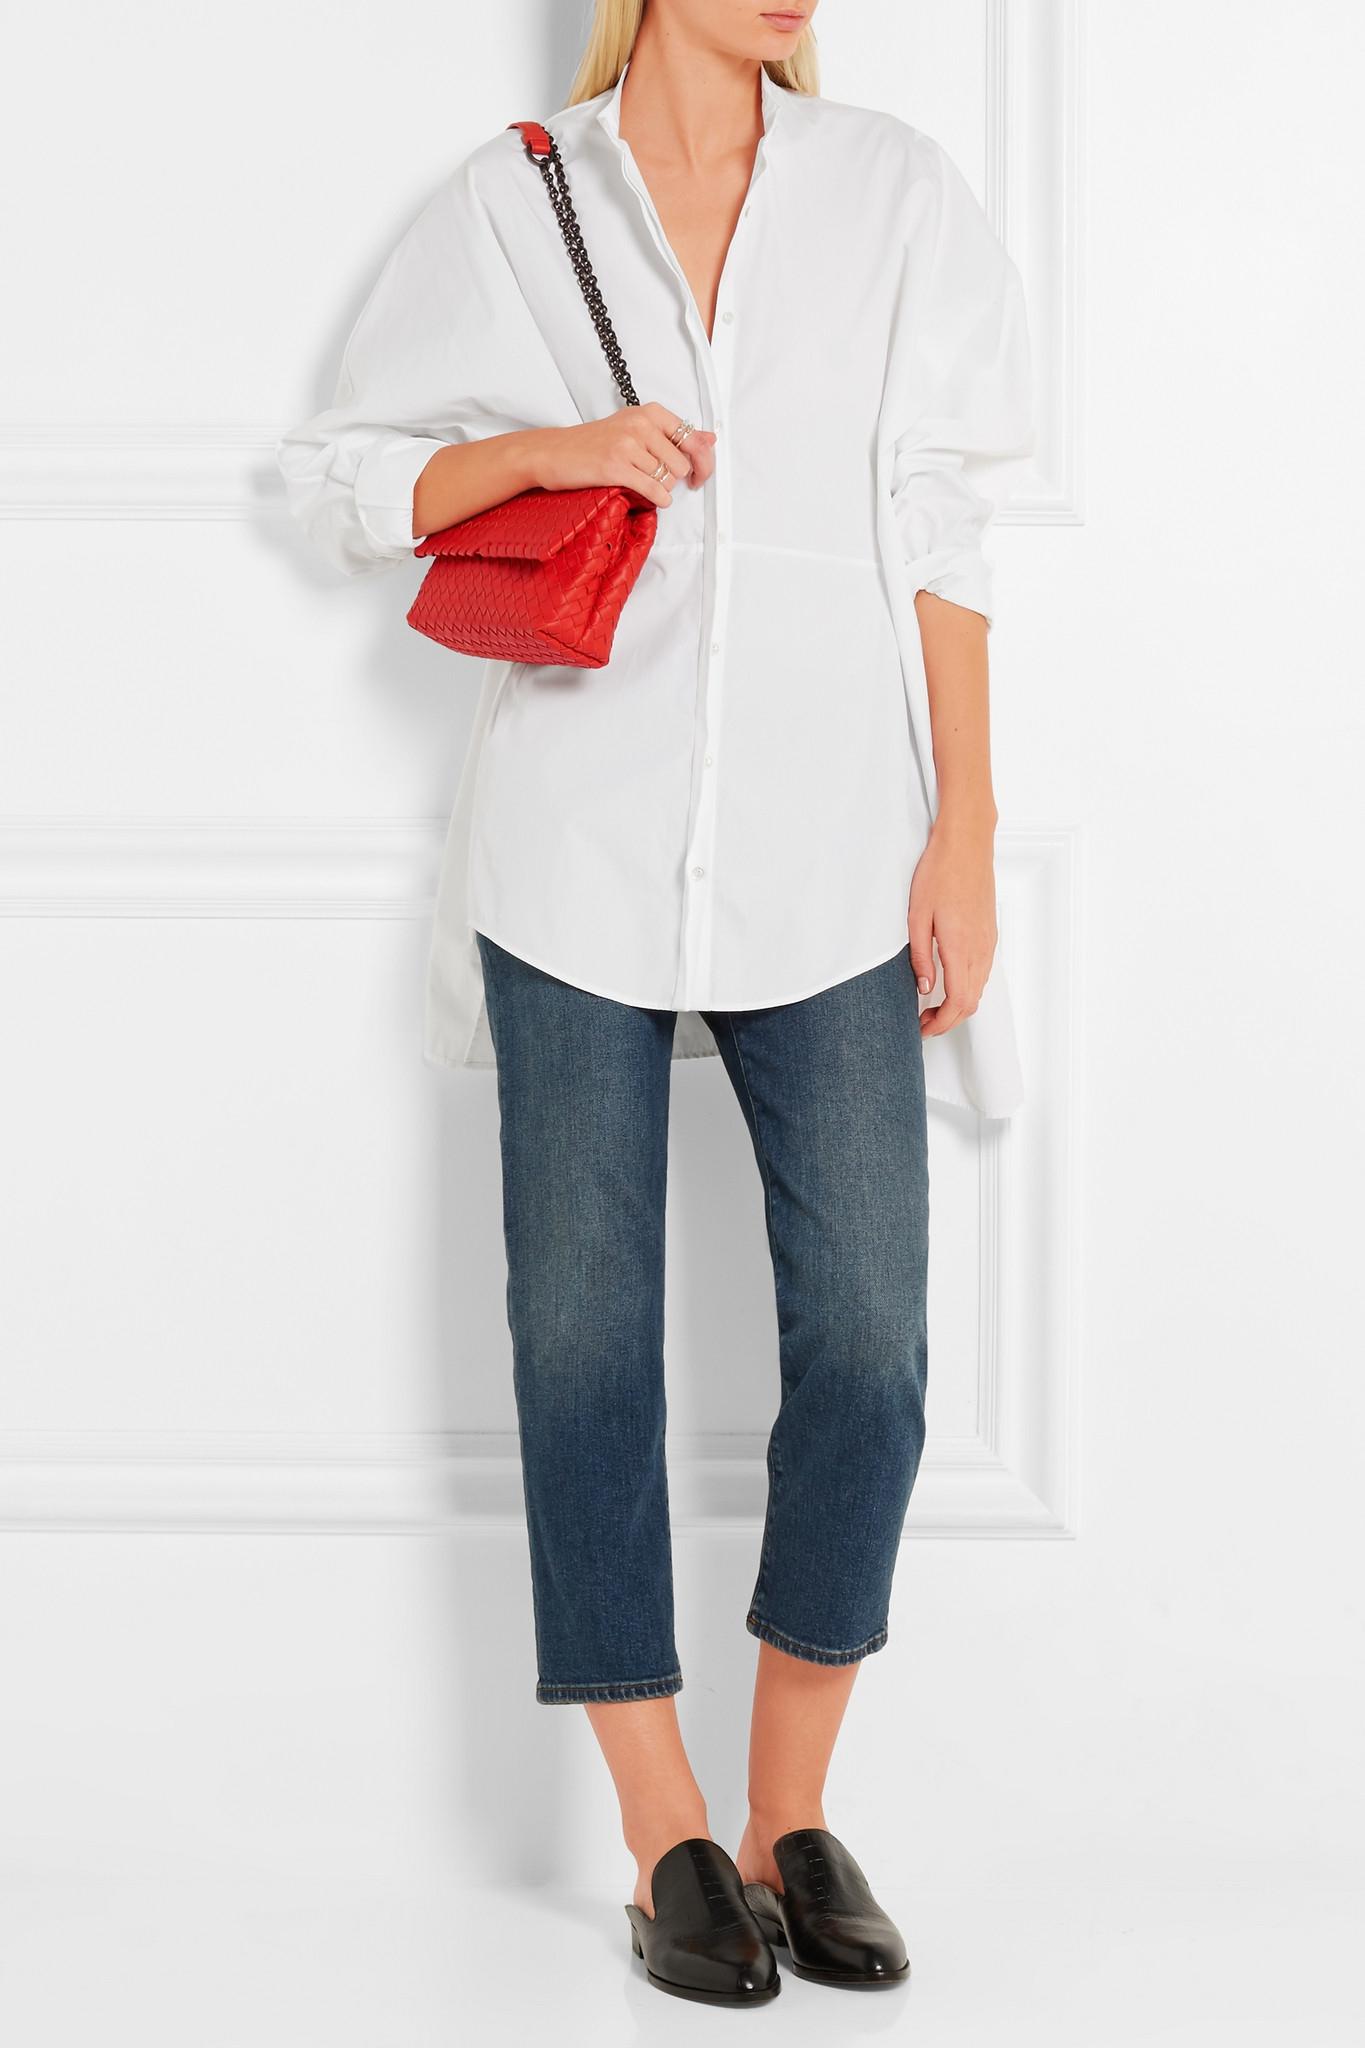 b078c772e945 Bottega Veneta Olimpia Mini Intrecciato Leather Shoulder Bag in Red ...